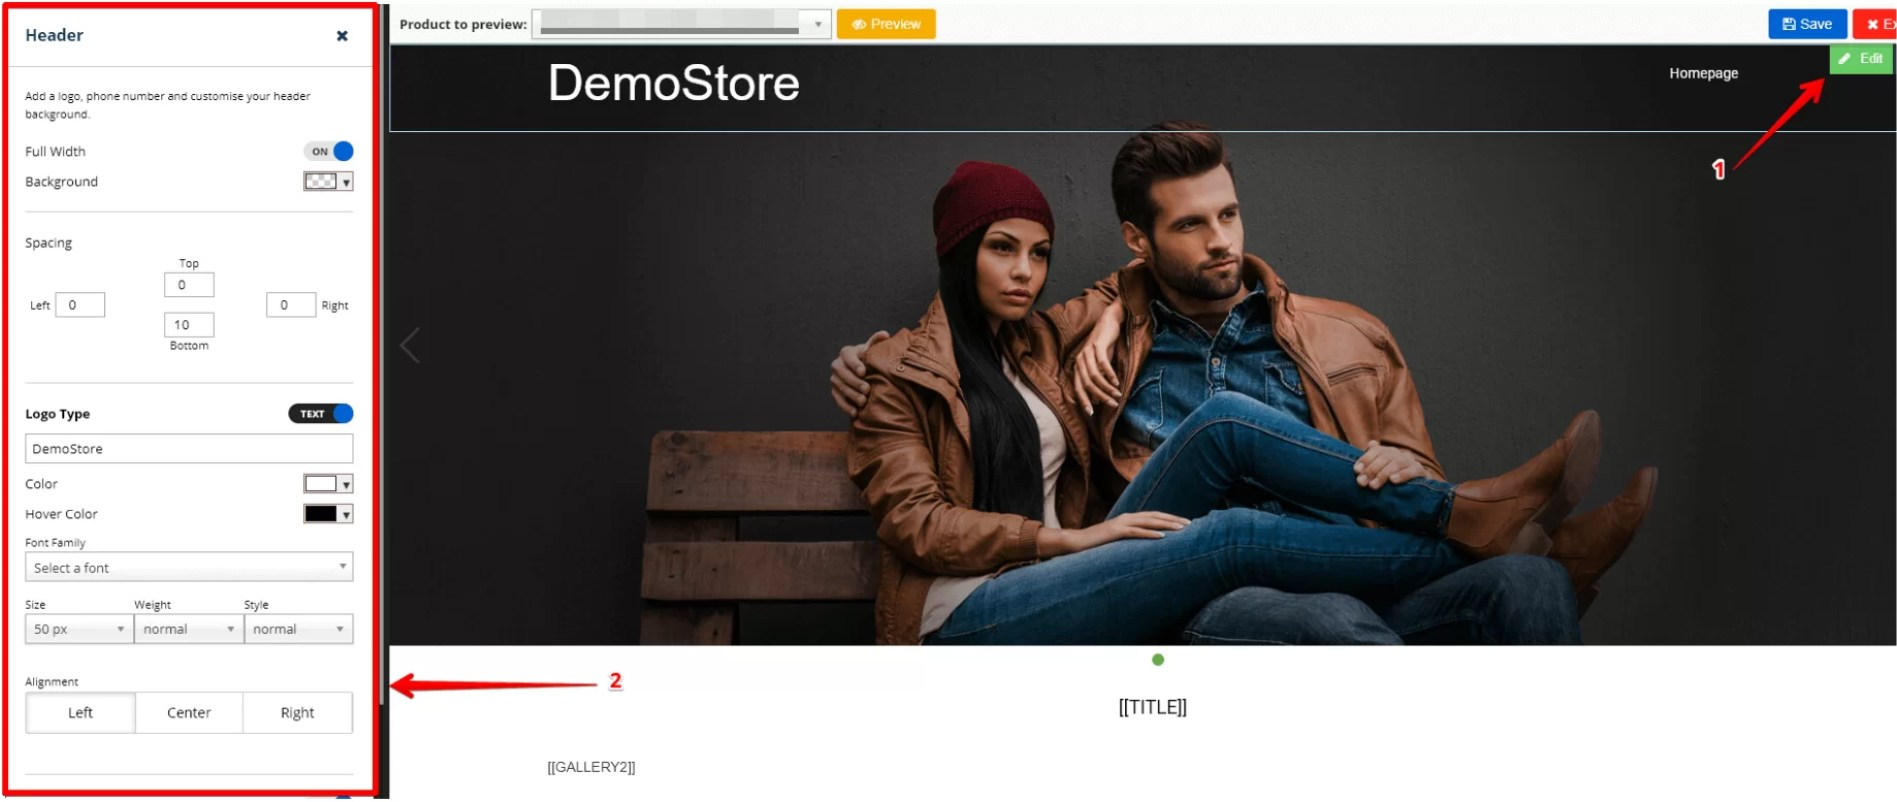 ebay Listing template Editing options